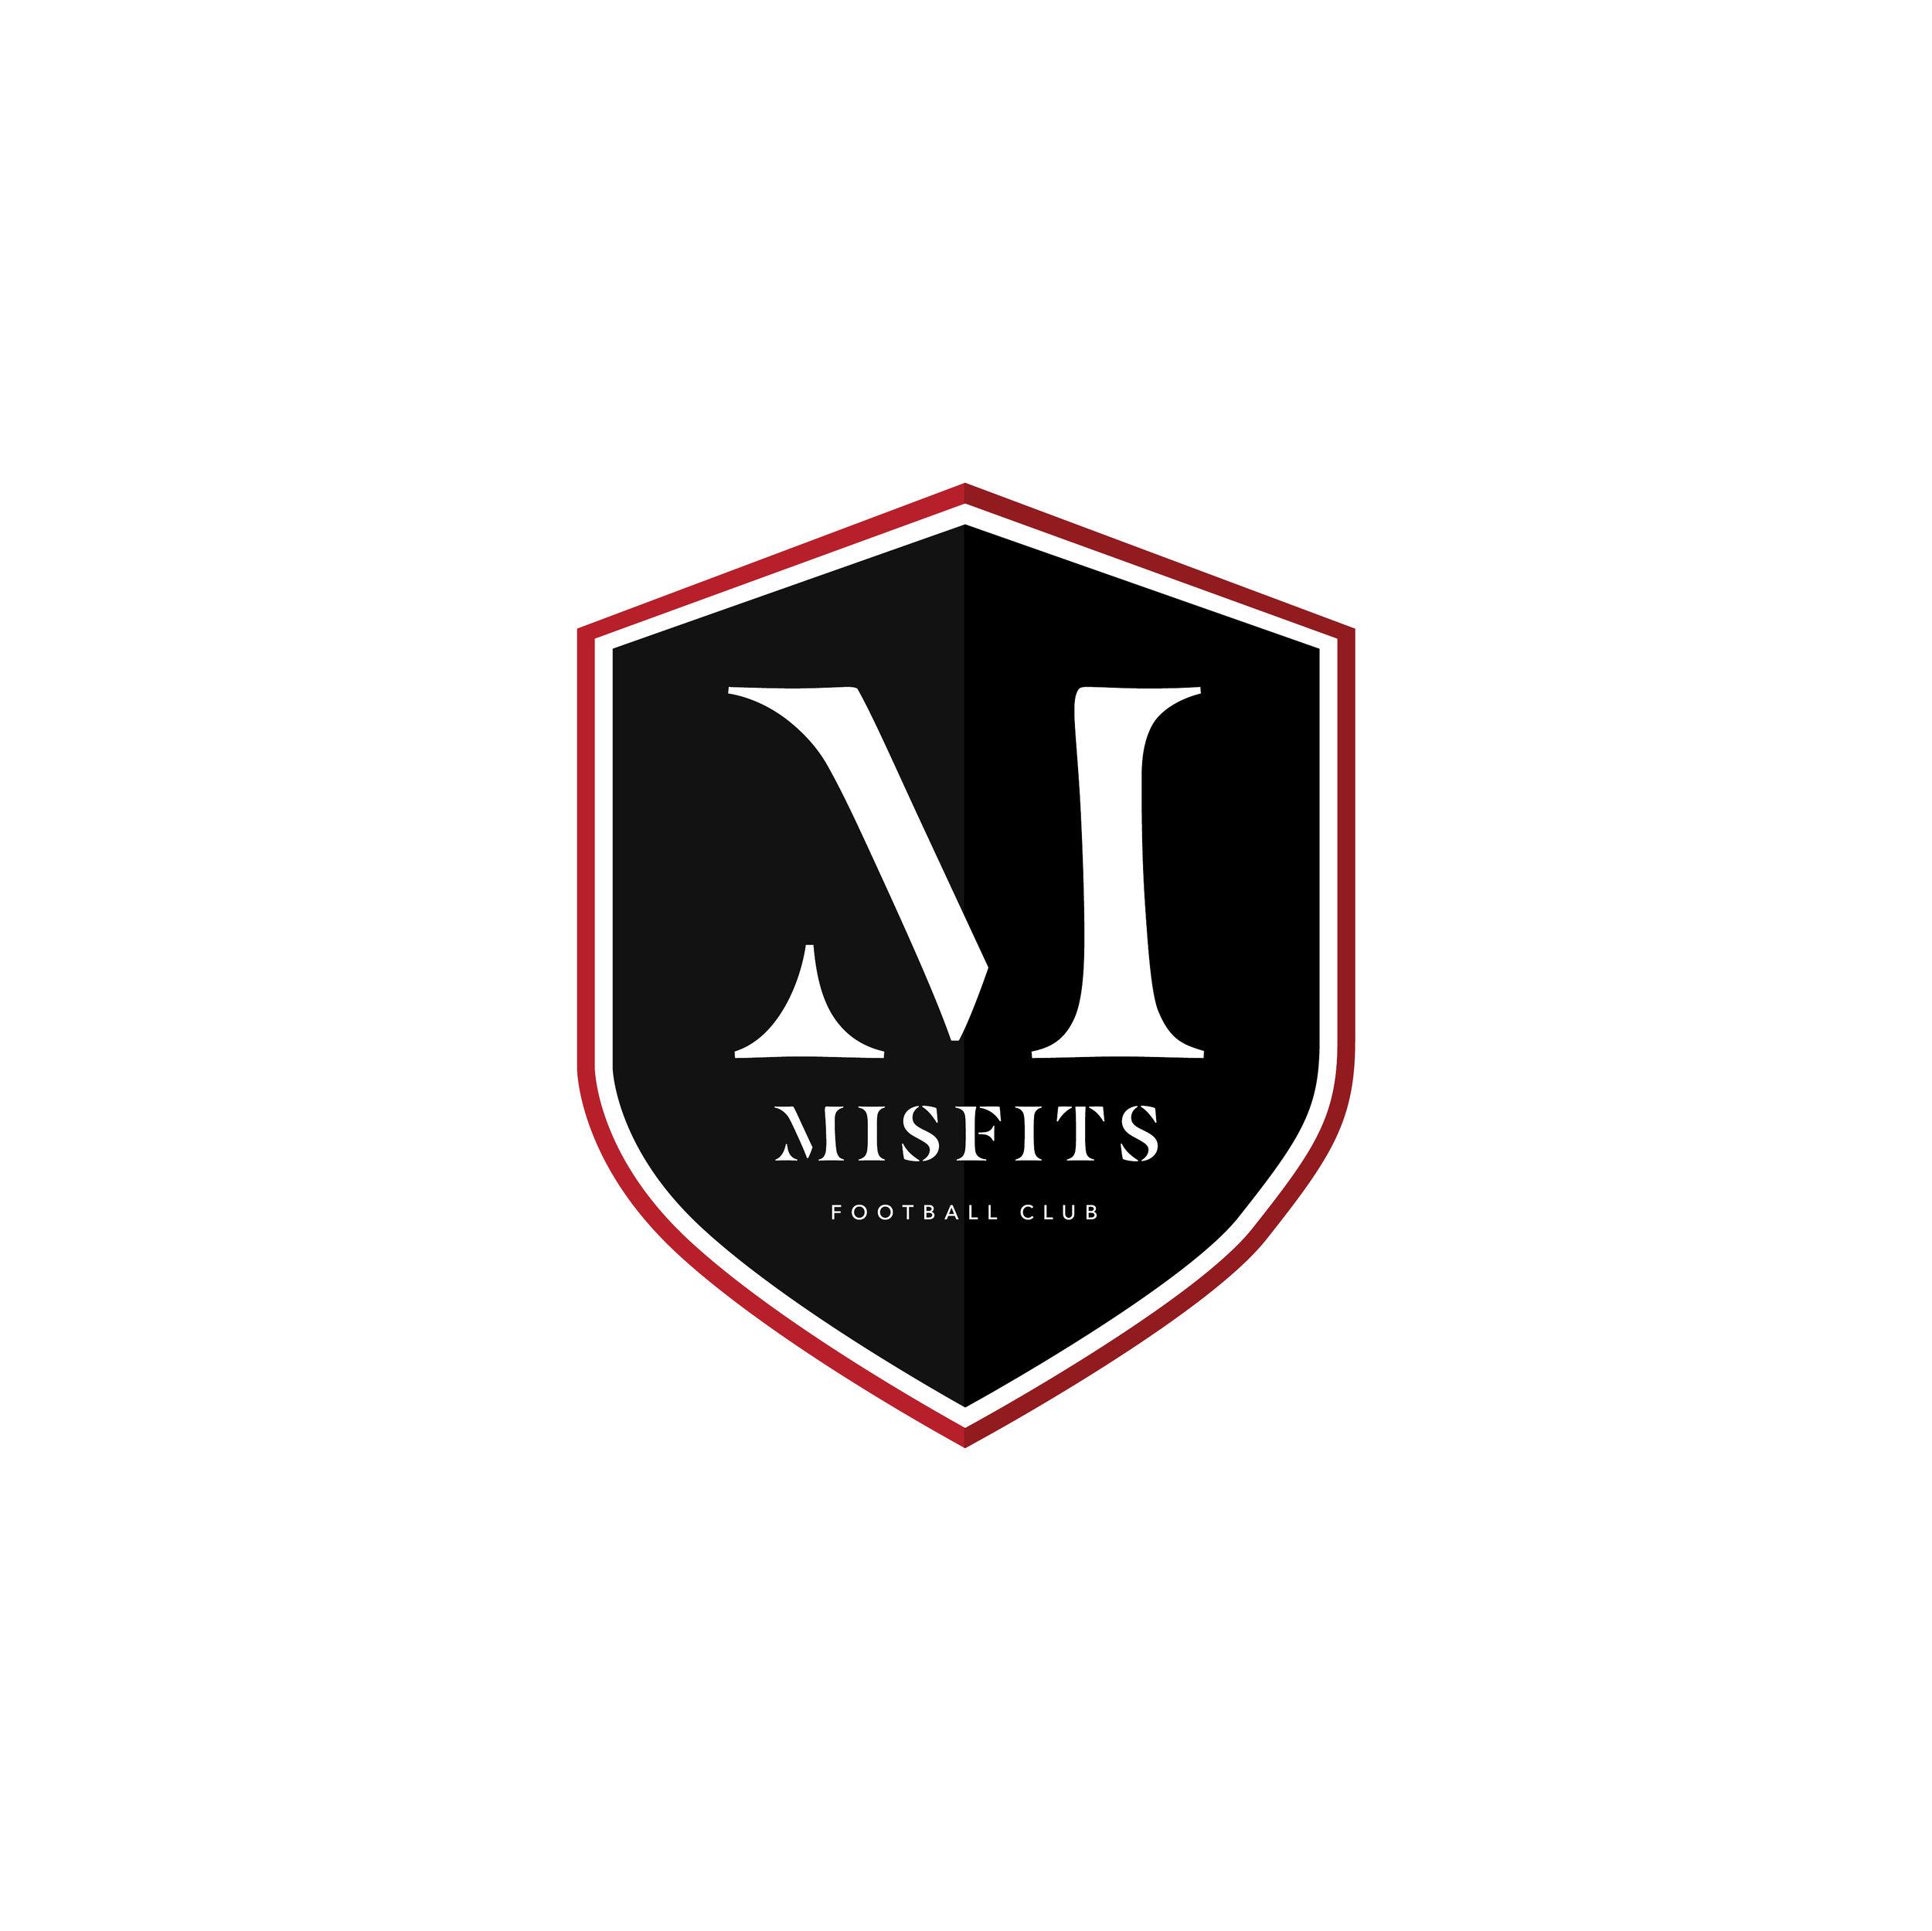 GMSA Crest Redesign-29.jpg